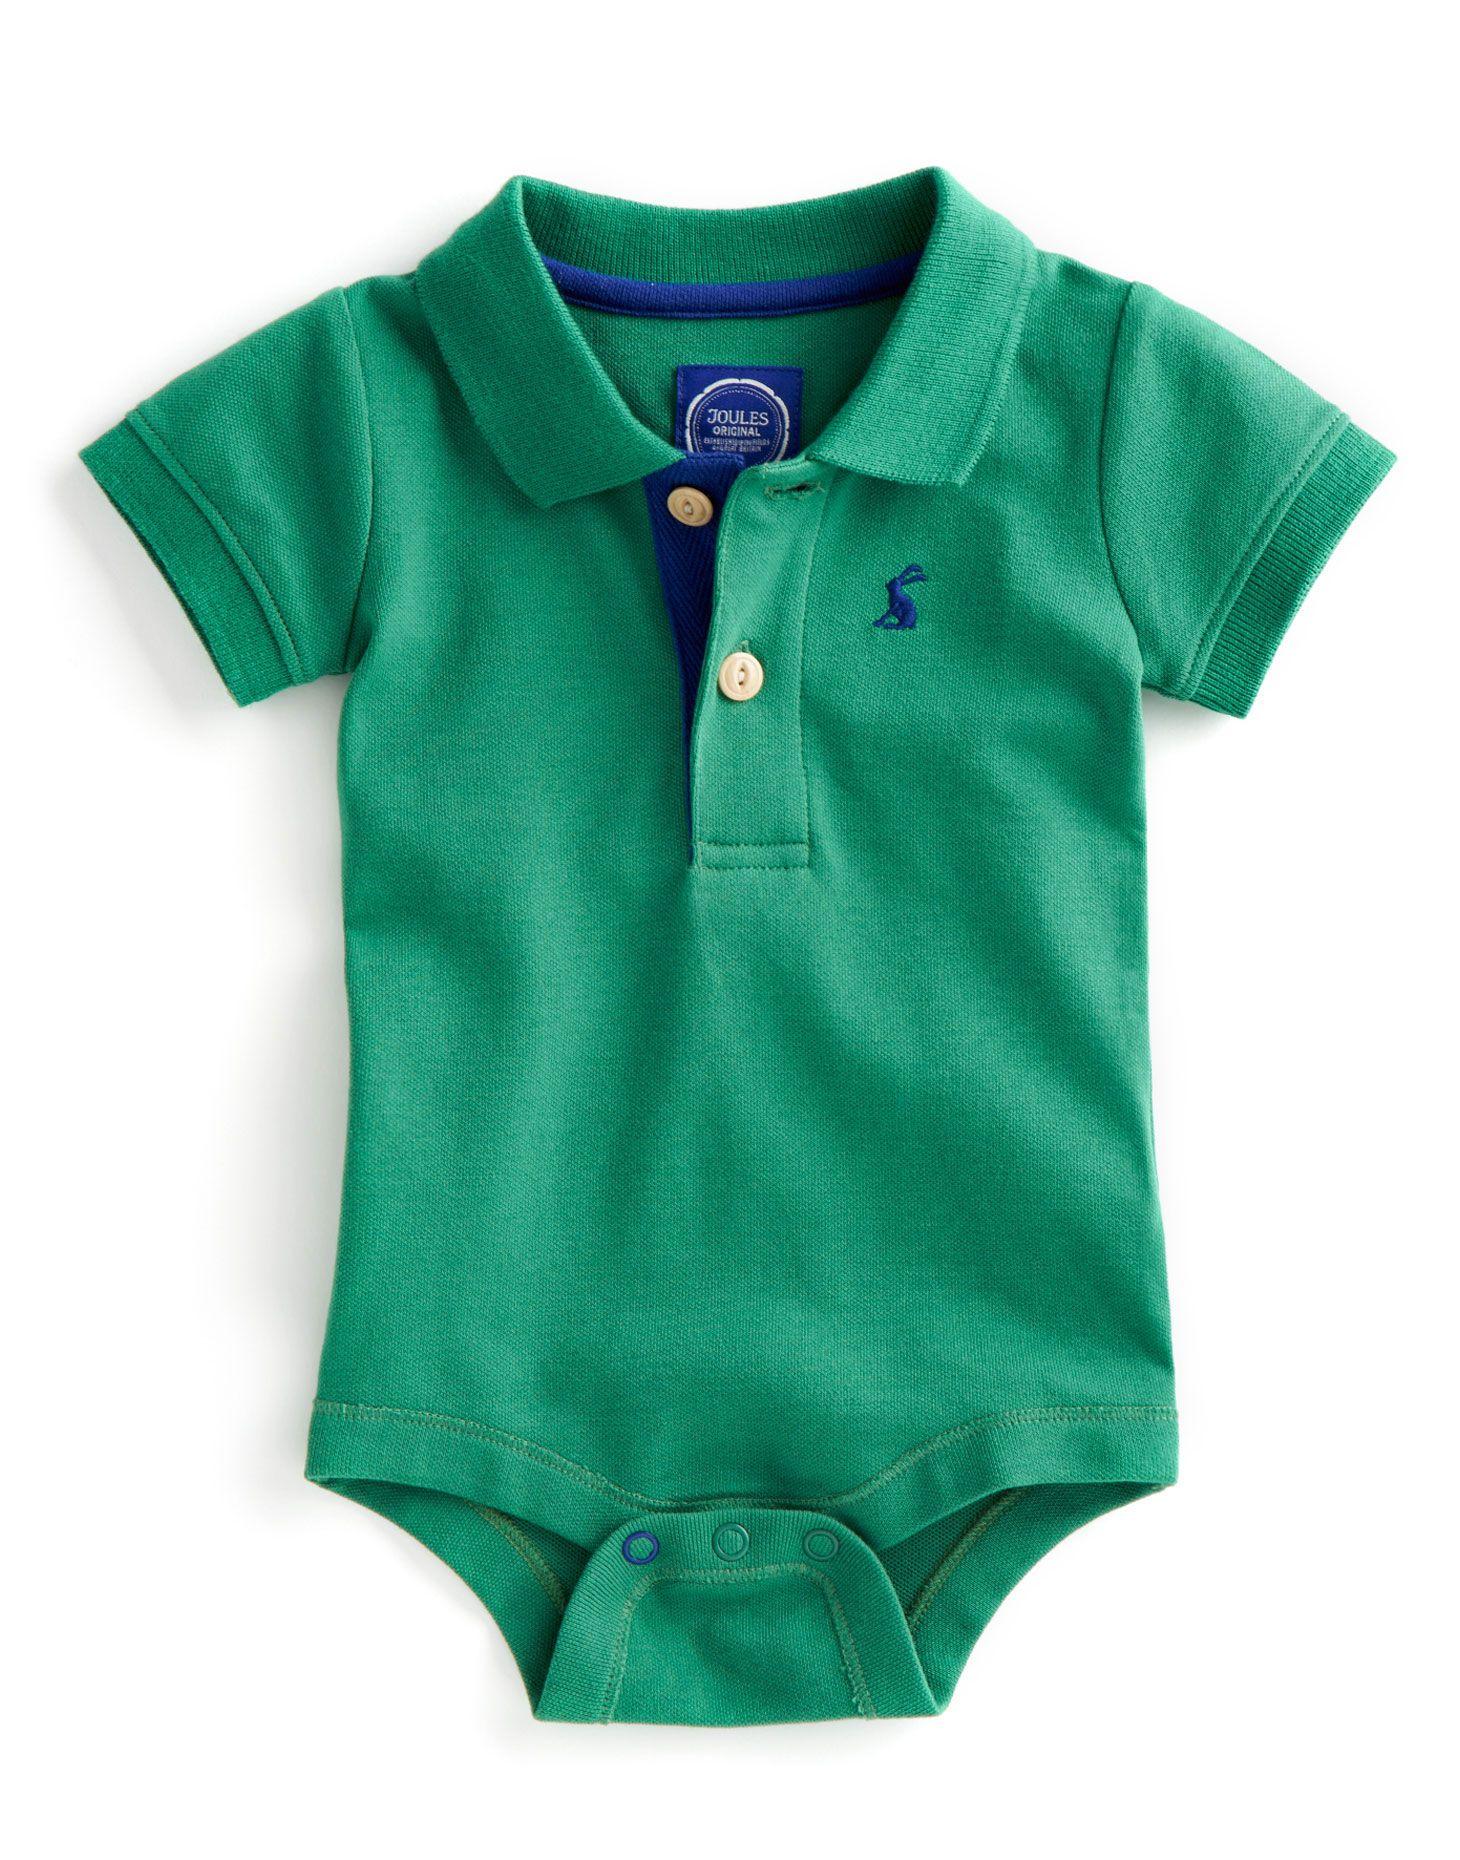 BABY TOM Baby Boy Polo Romper | Wedding :-) | Pinterest | Baby toms